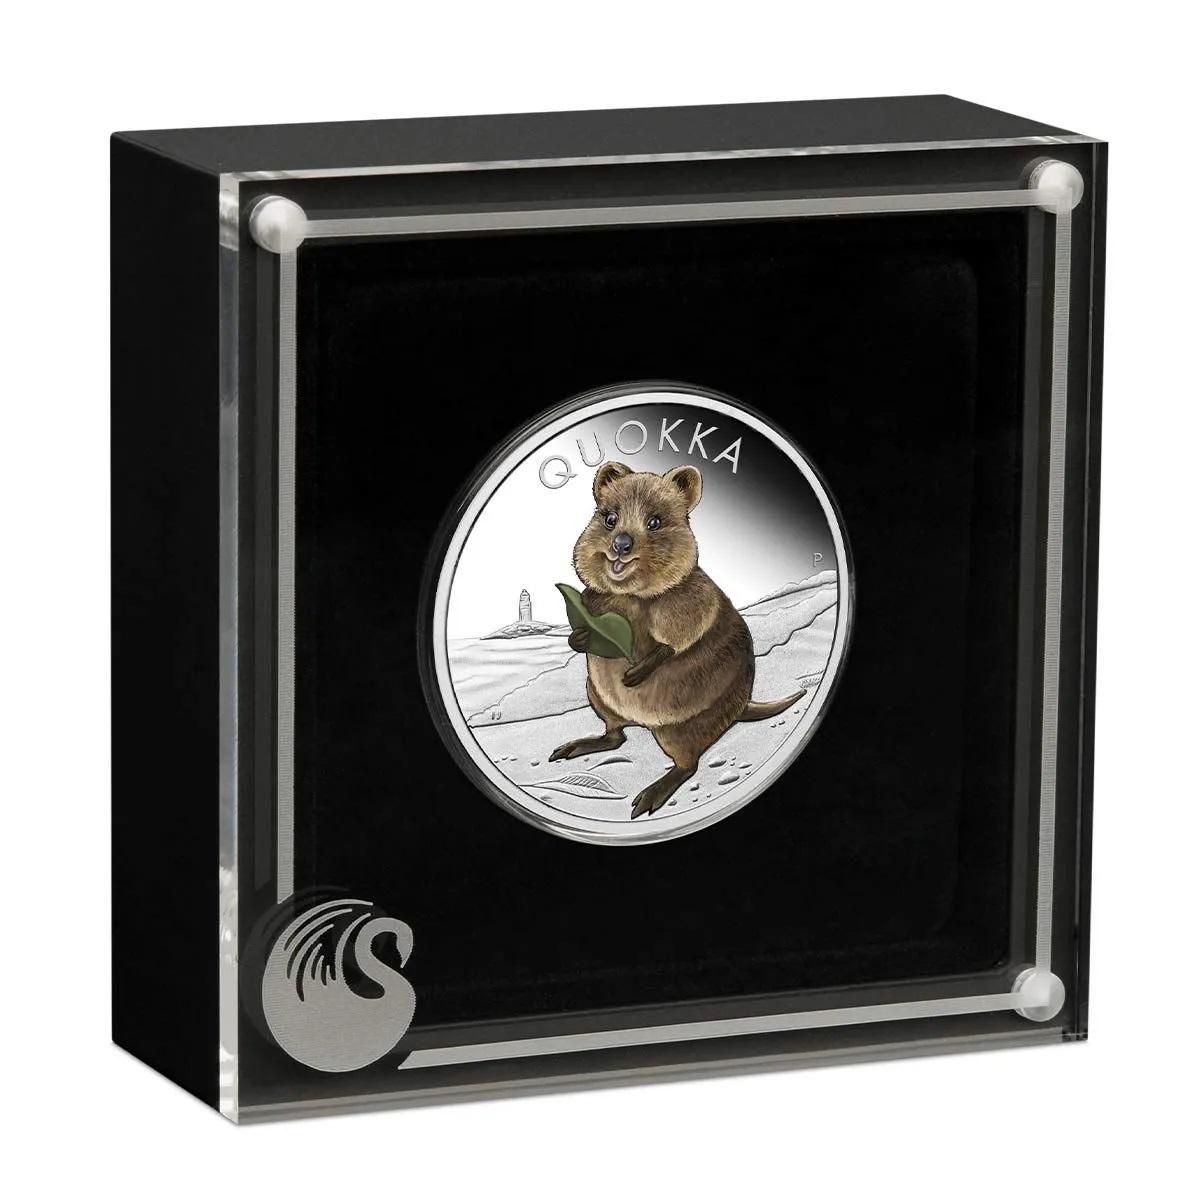 Австралия монета 1 доллар Квокка, подарочная упаковка